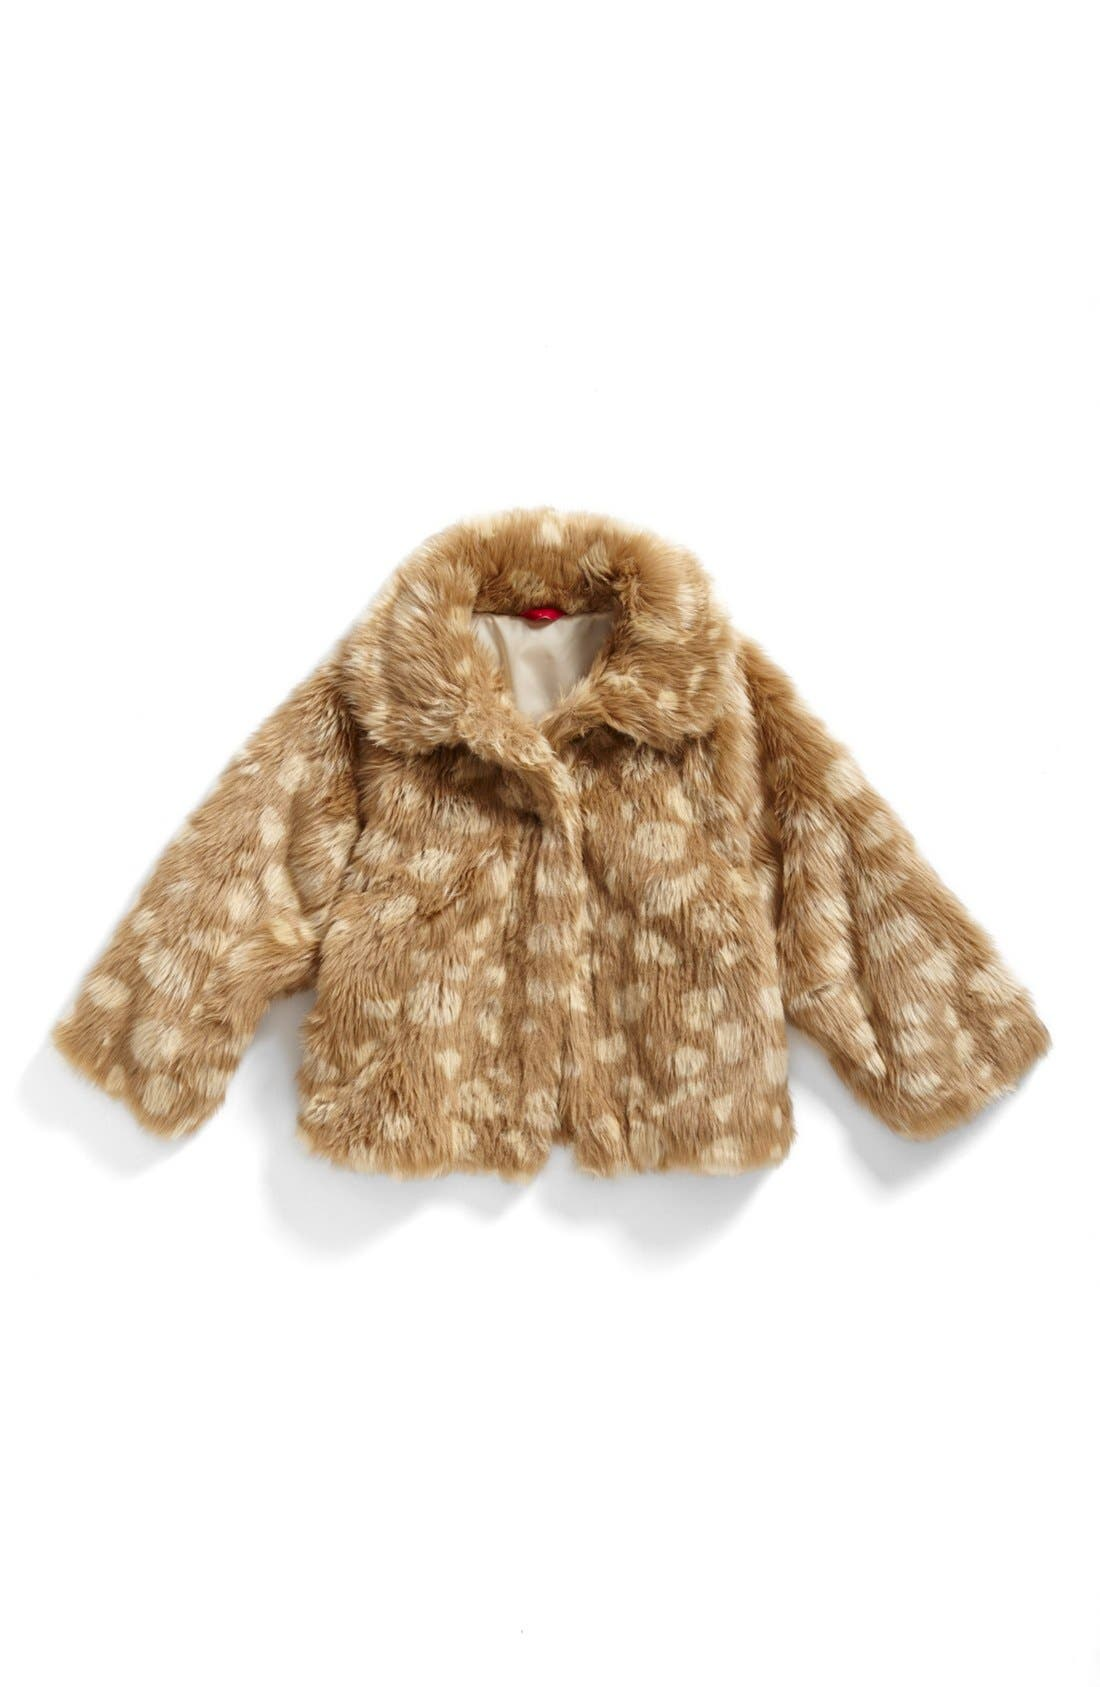 Alternate Image 1 Selected - Ruby & Bloom 'Mia' Faux Fur Coat (Big Girls)